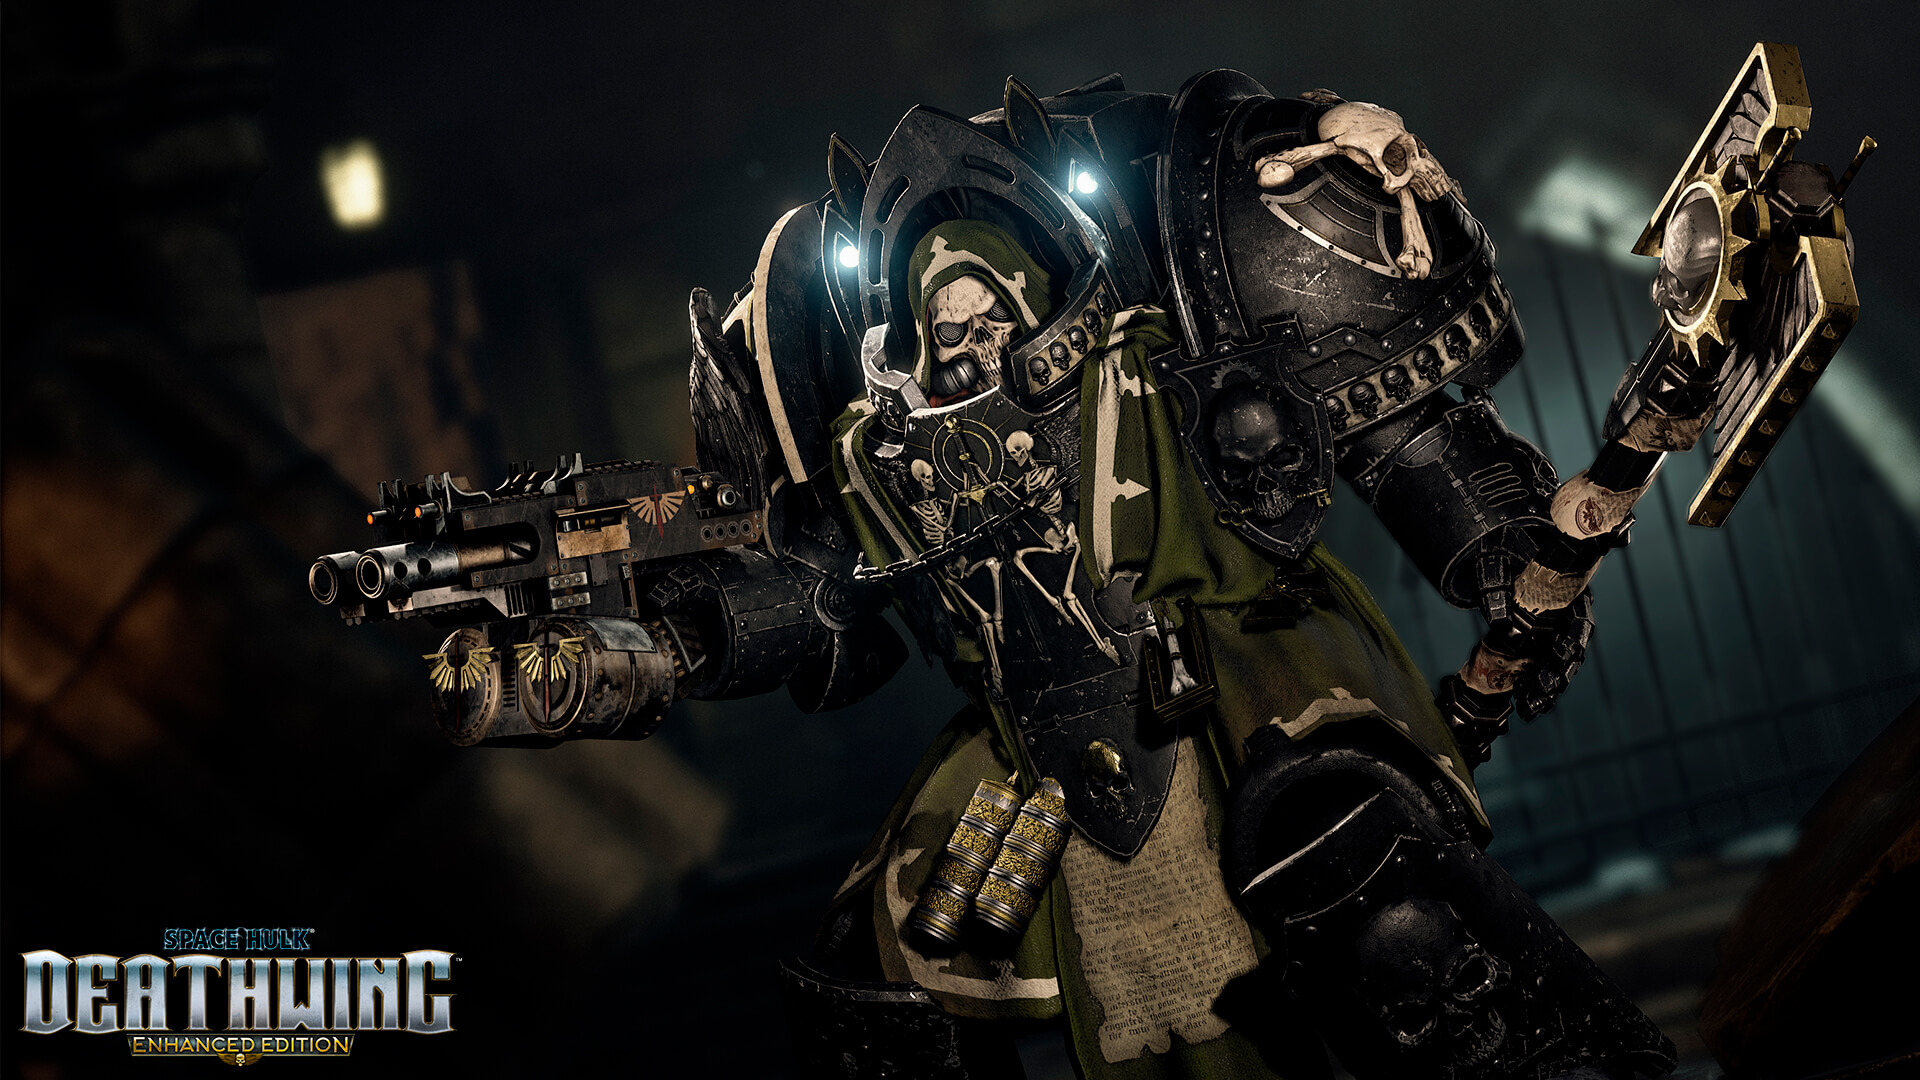 space hulk deathwing enhanced edition ps4 amazon